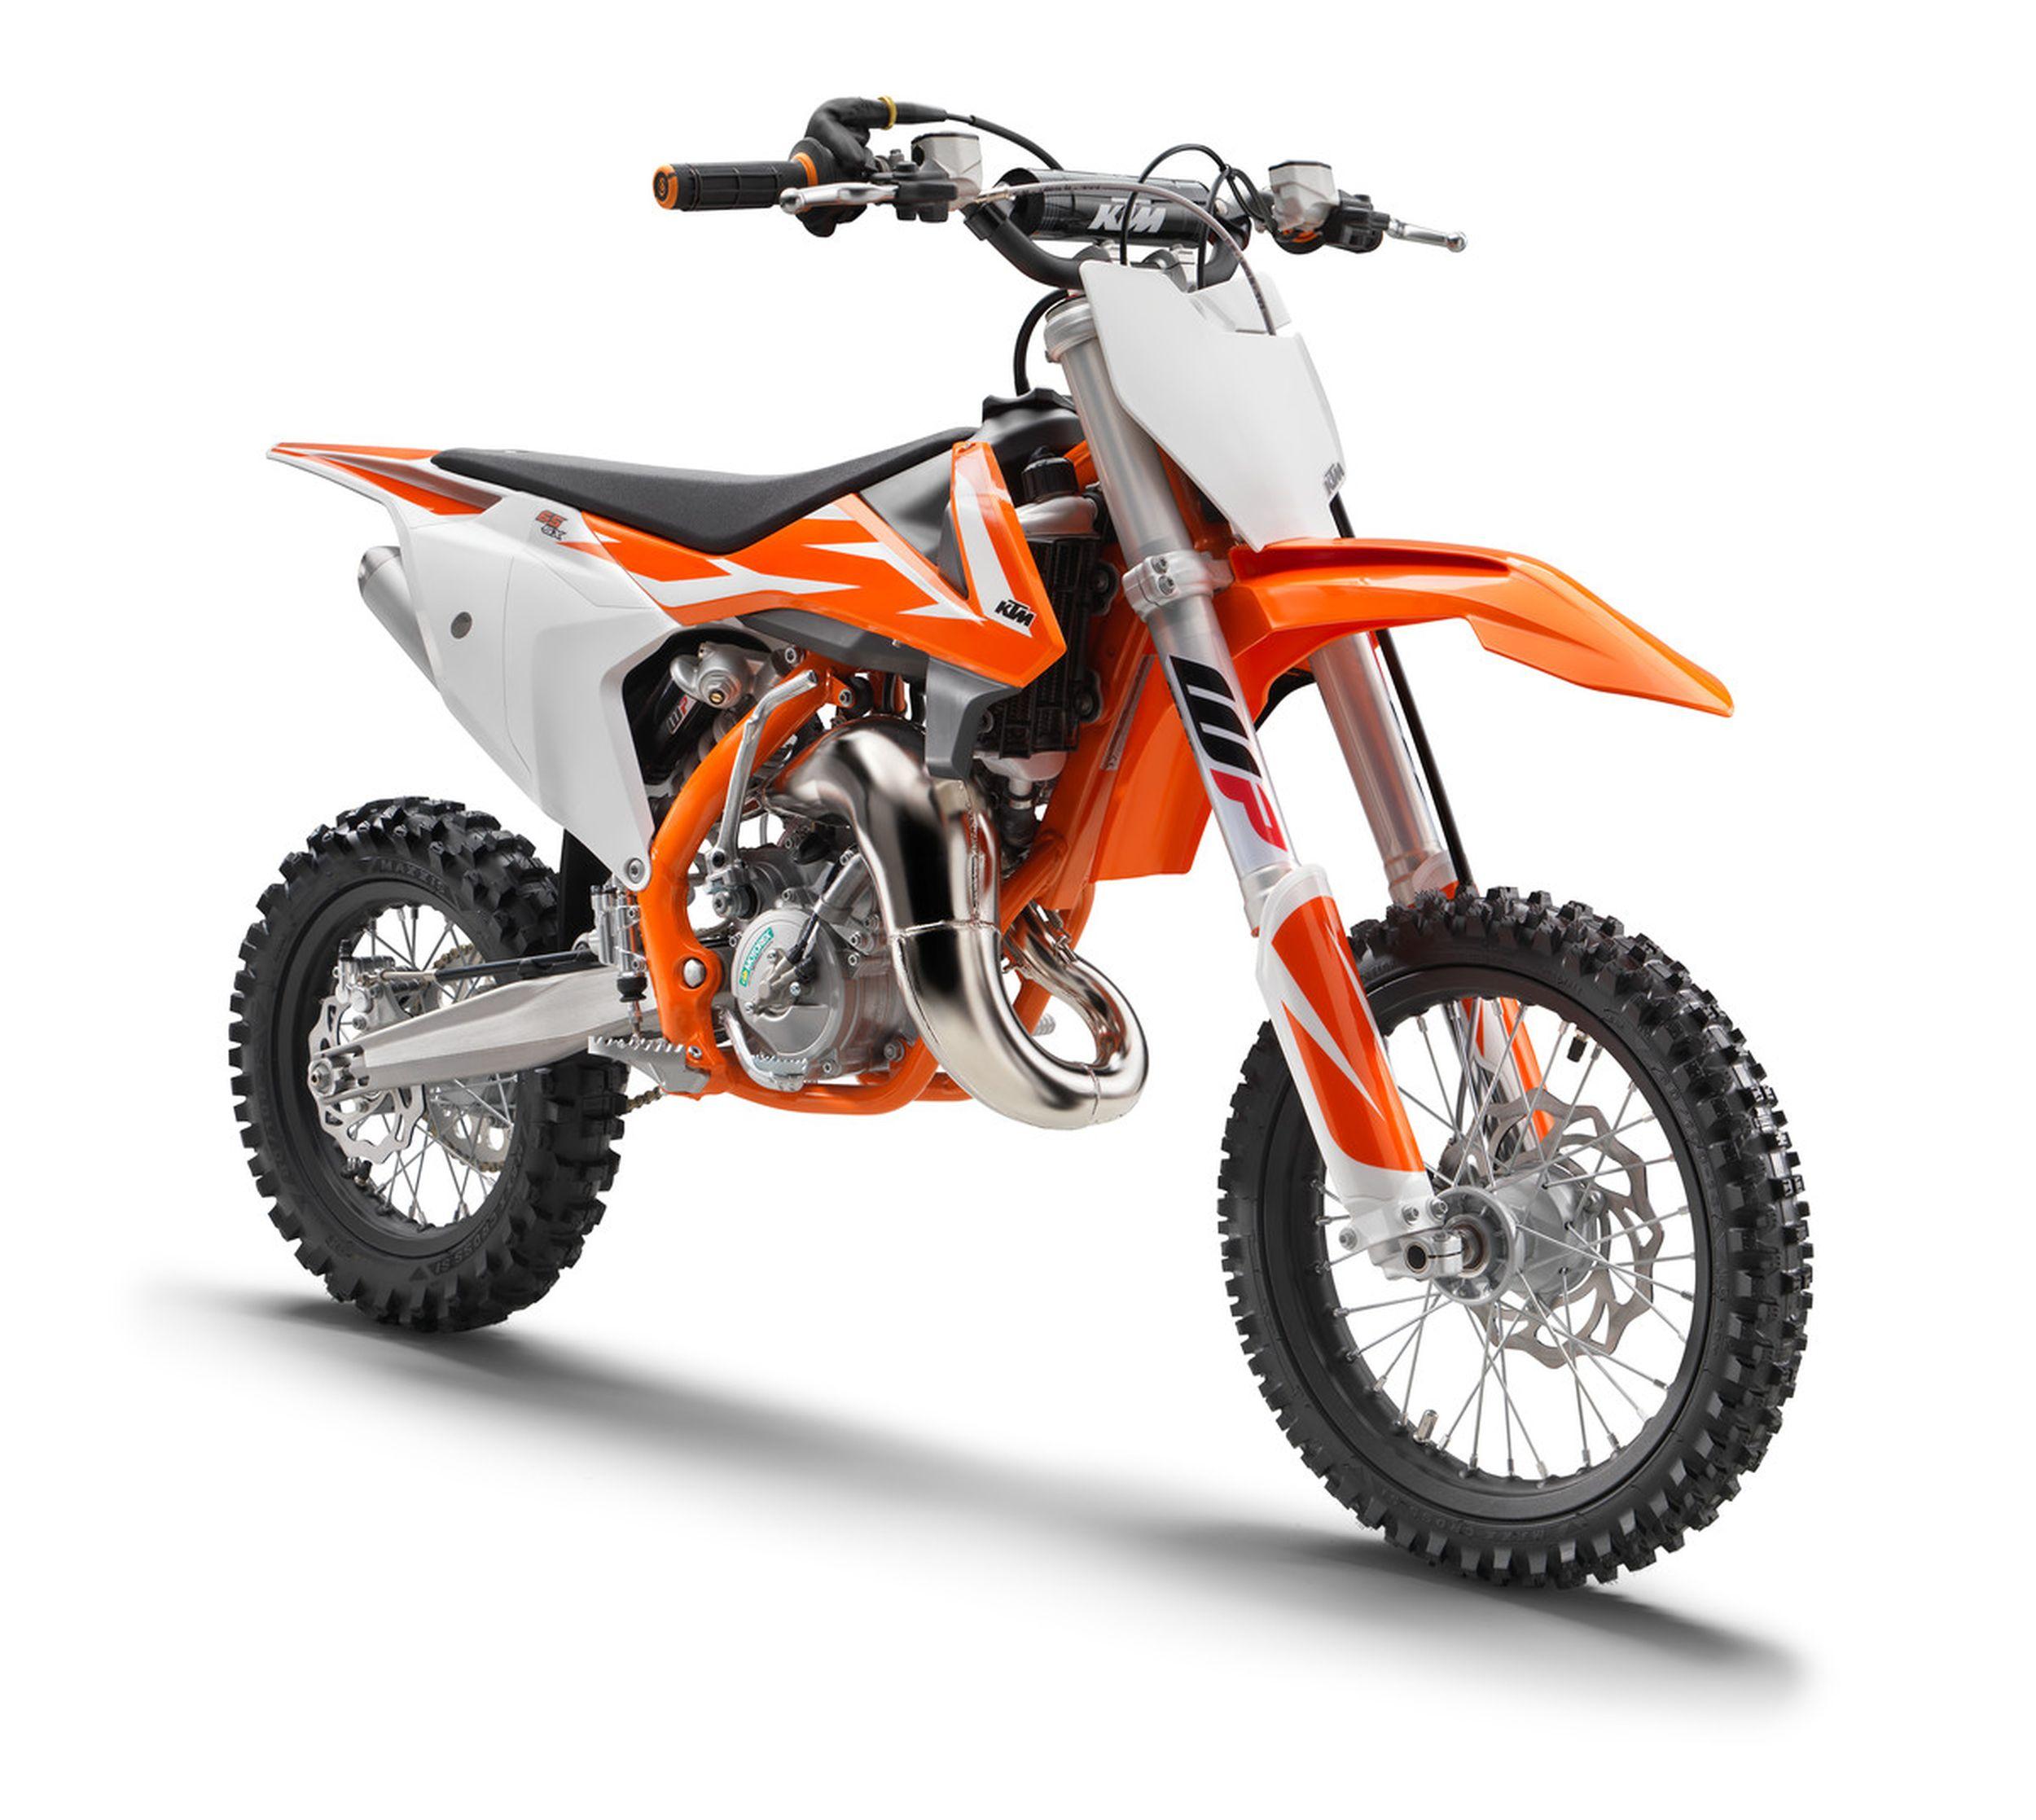 Ktm Sx Dirt Bike Price